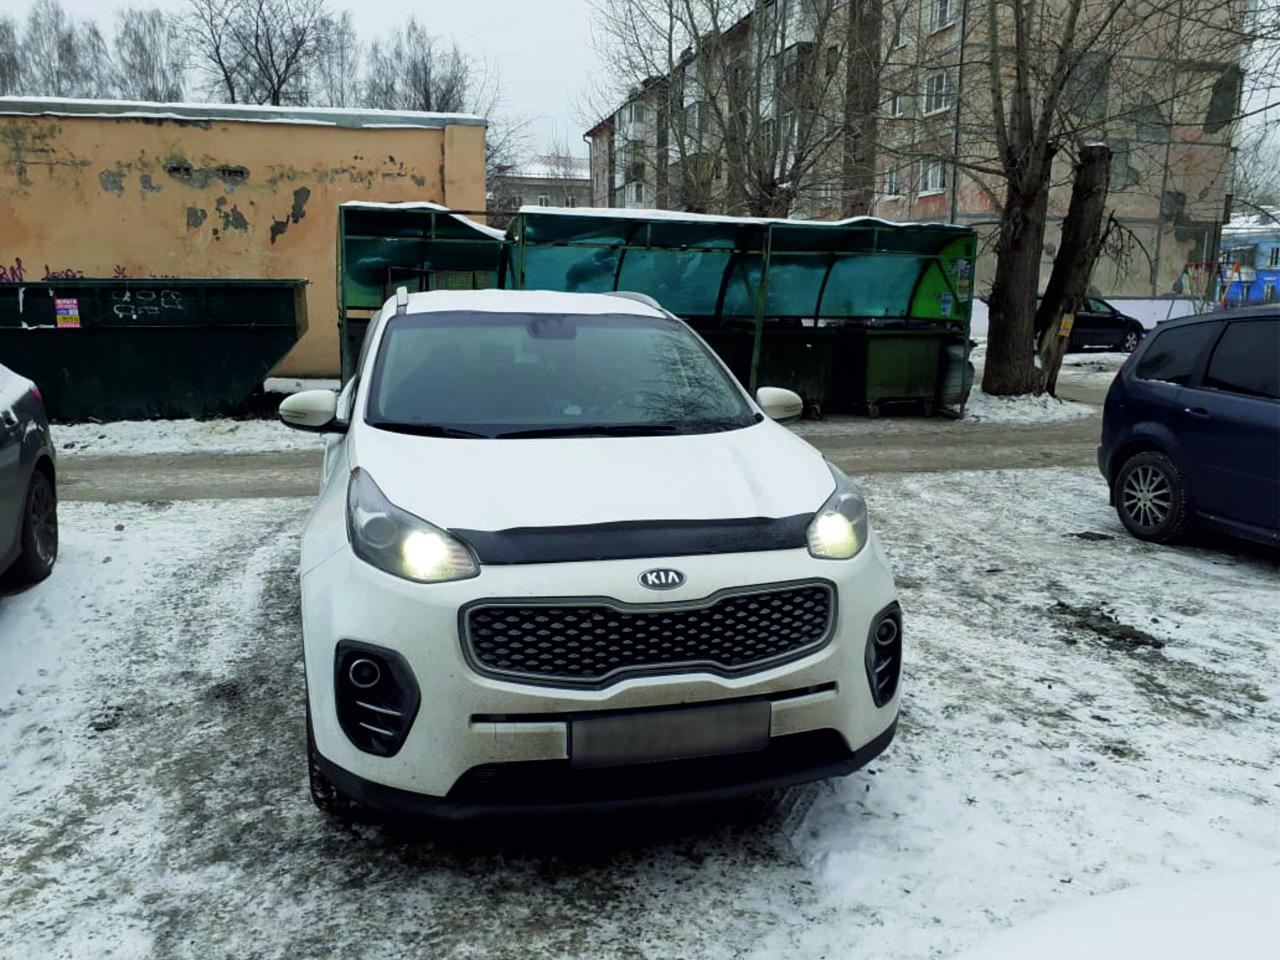 arestovali-kia1